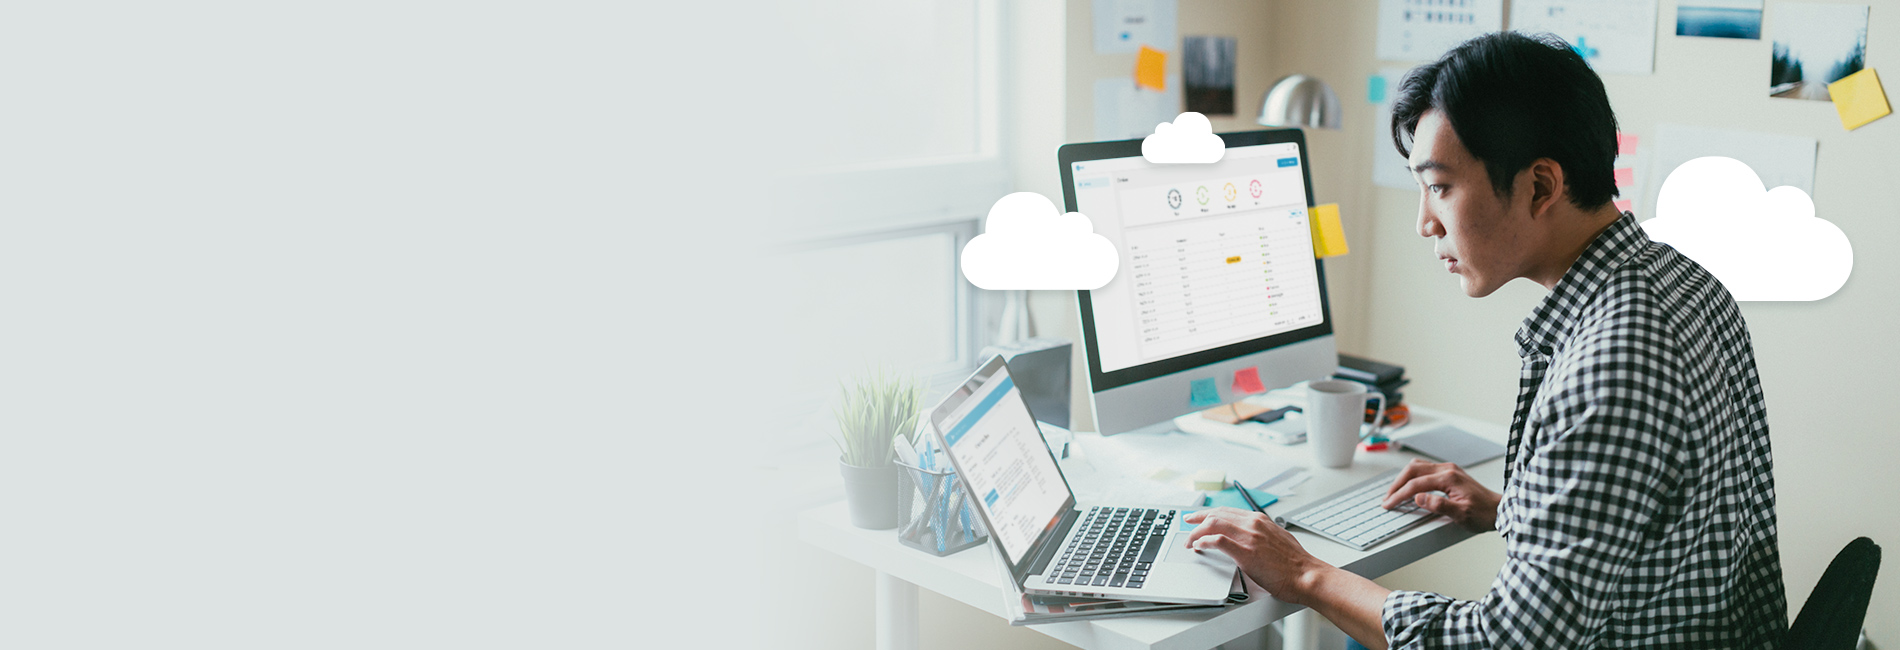 IT Professional managing meeting room audio on Nureva Console